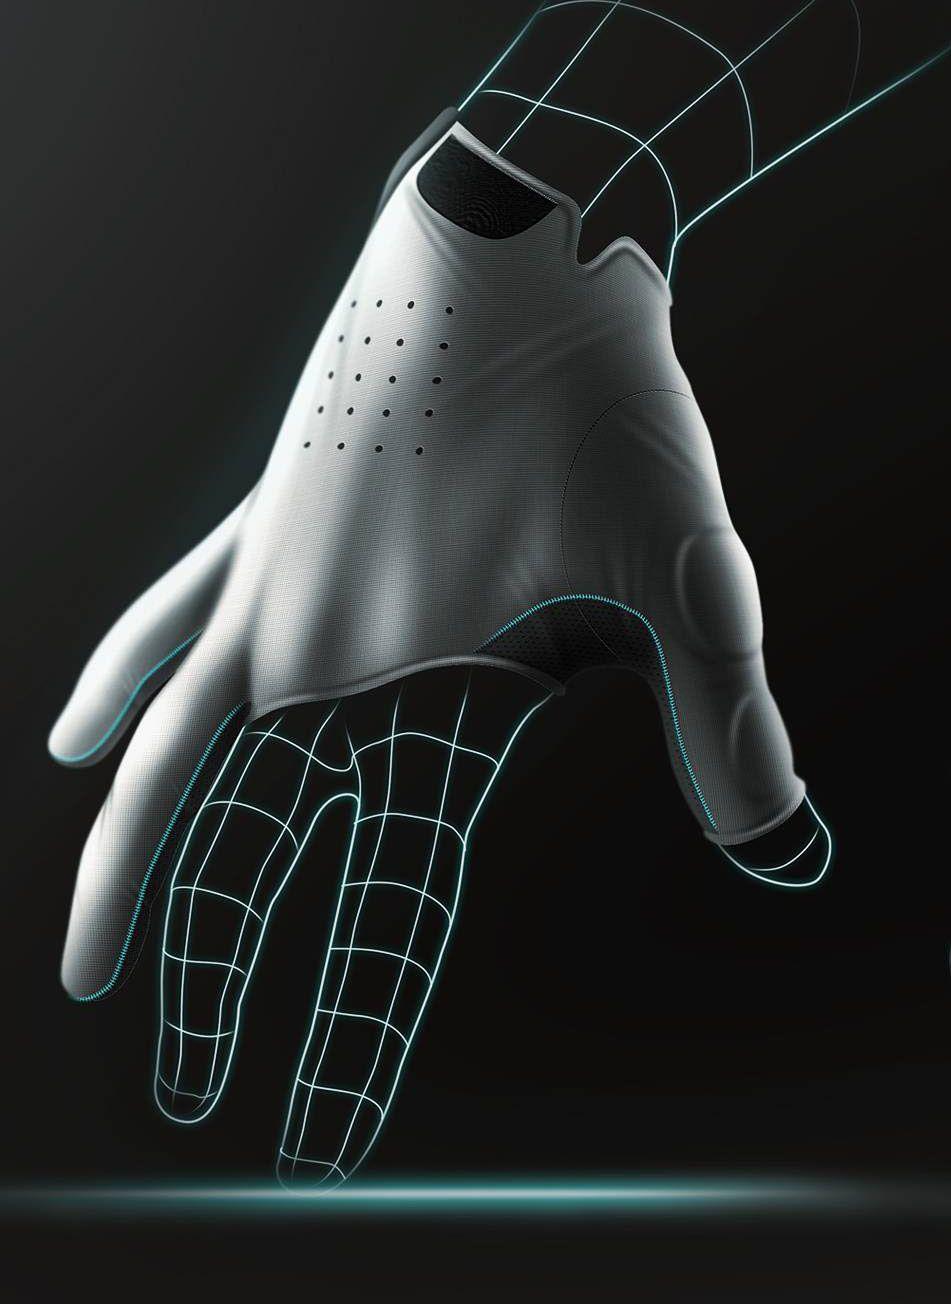 https://www.behance.net/gallery/5917505/ADIDAS-Cricket-innovation